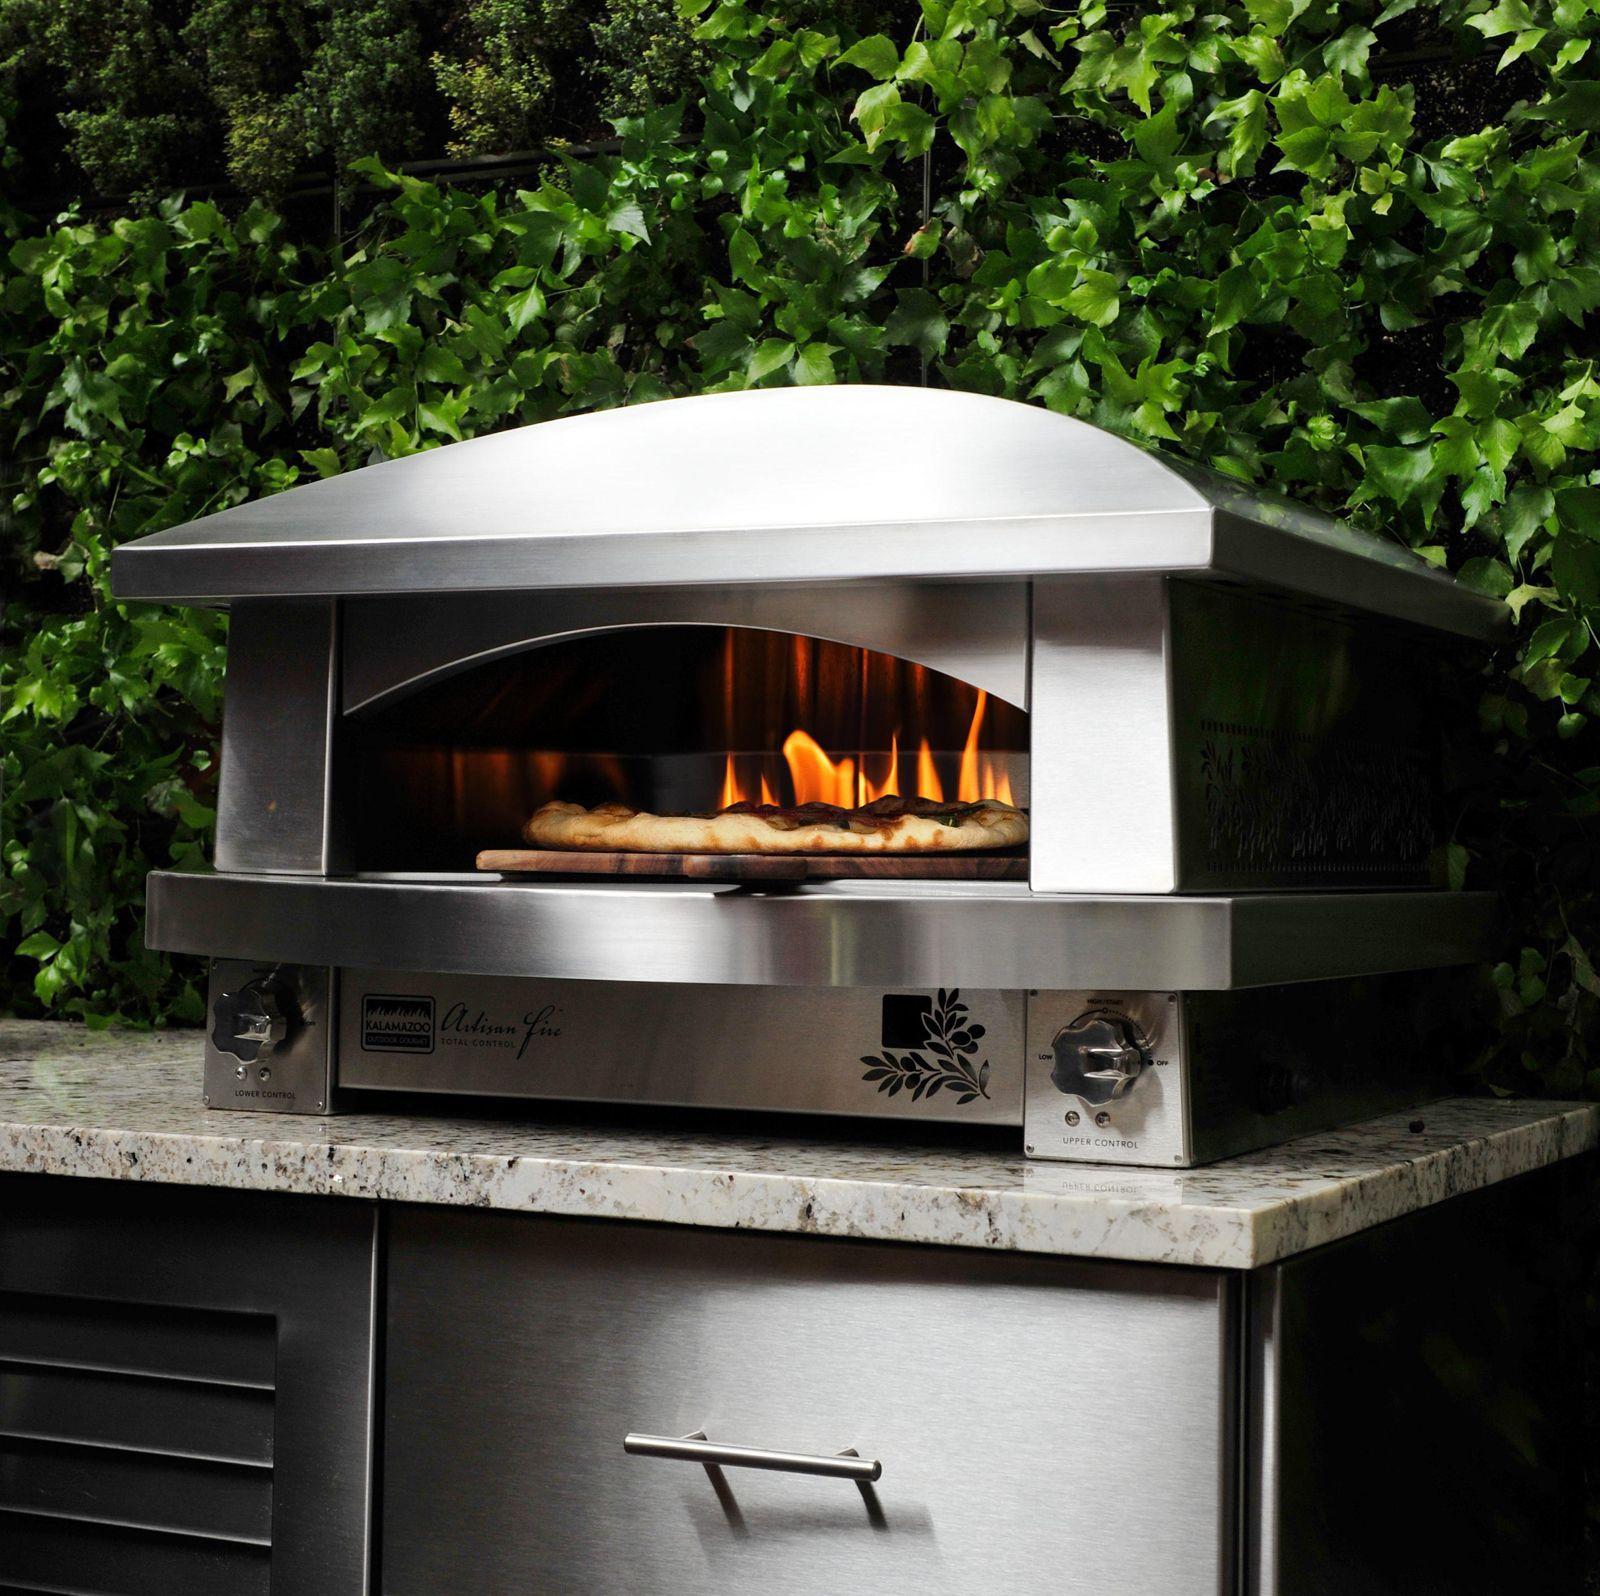 kalamazoo outdoor gourmet grills fire pizza countertop and gourmet. Black Bedroom Furniture Sets. Home Design Ideas